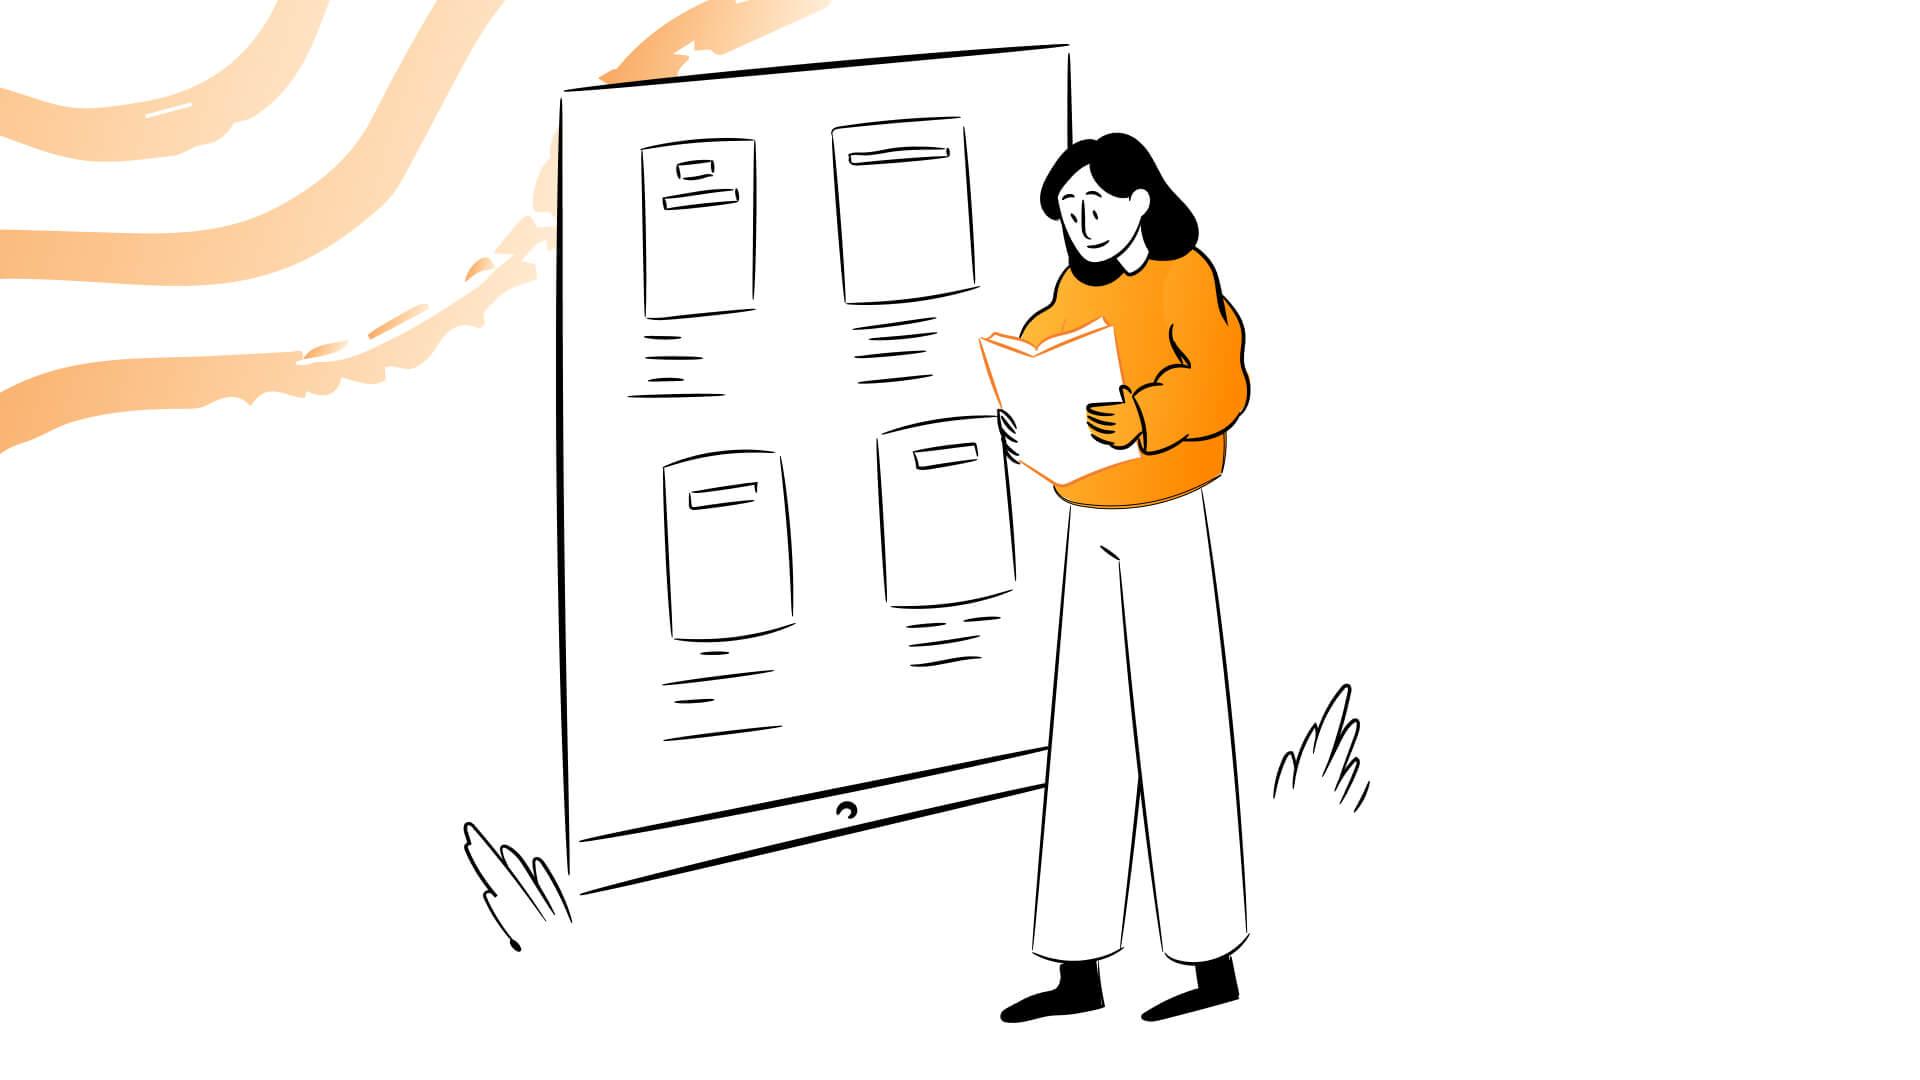 Mentorship Can Feel Intimidating - But It Shouldn't